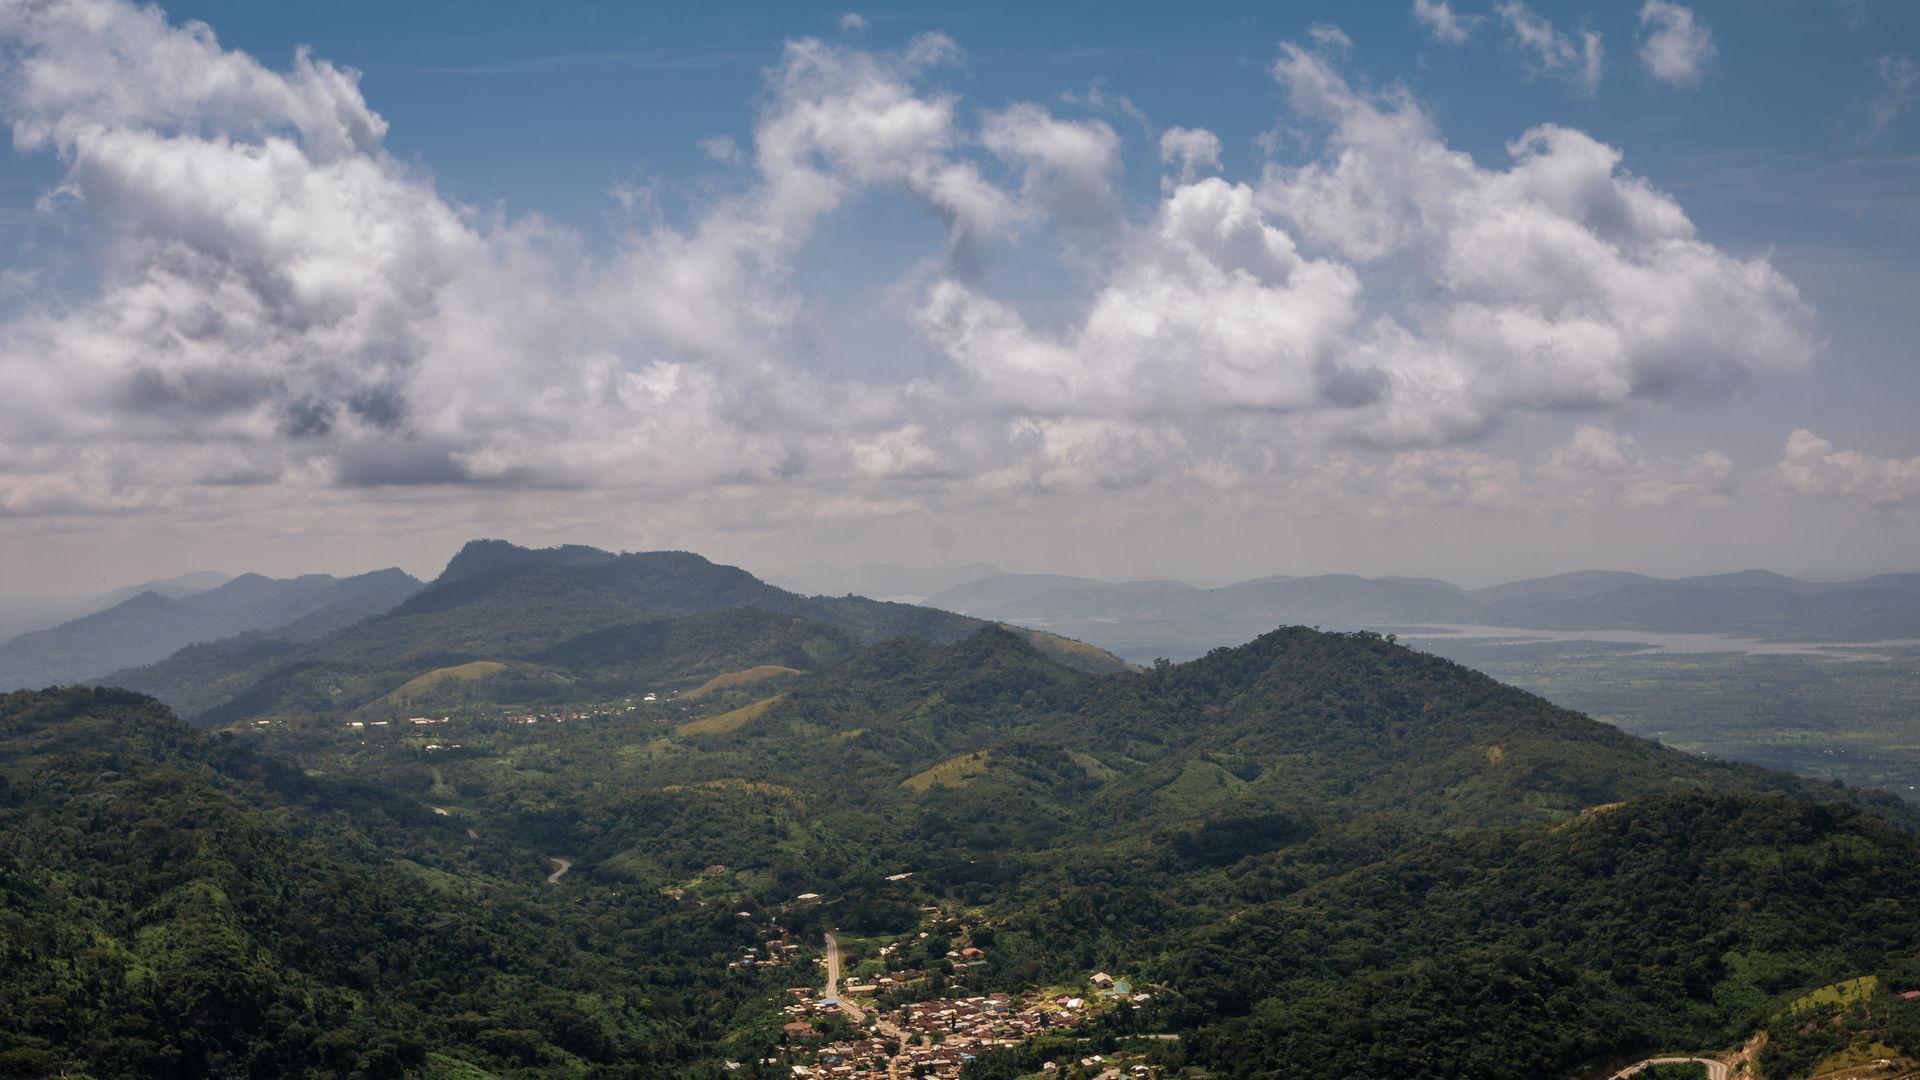 Mountain Gemi in Amedzope